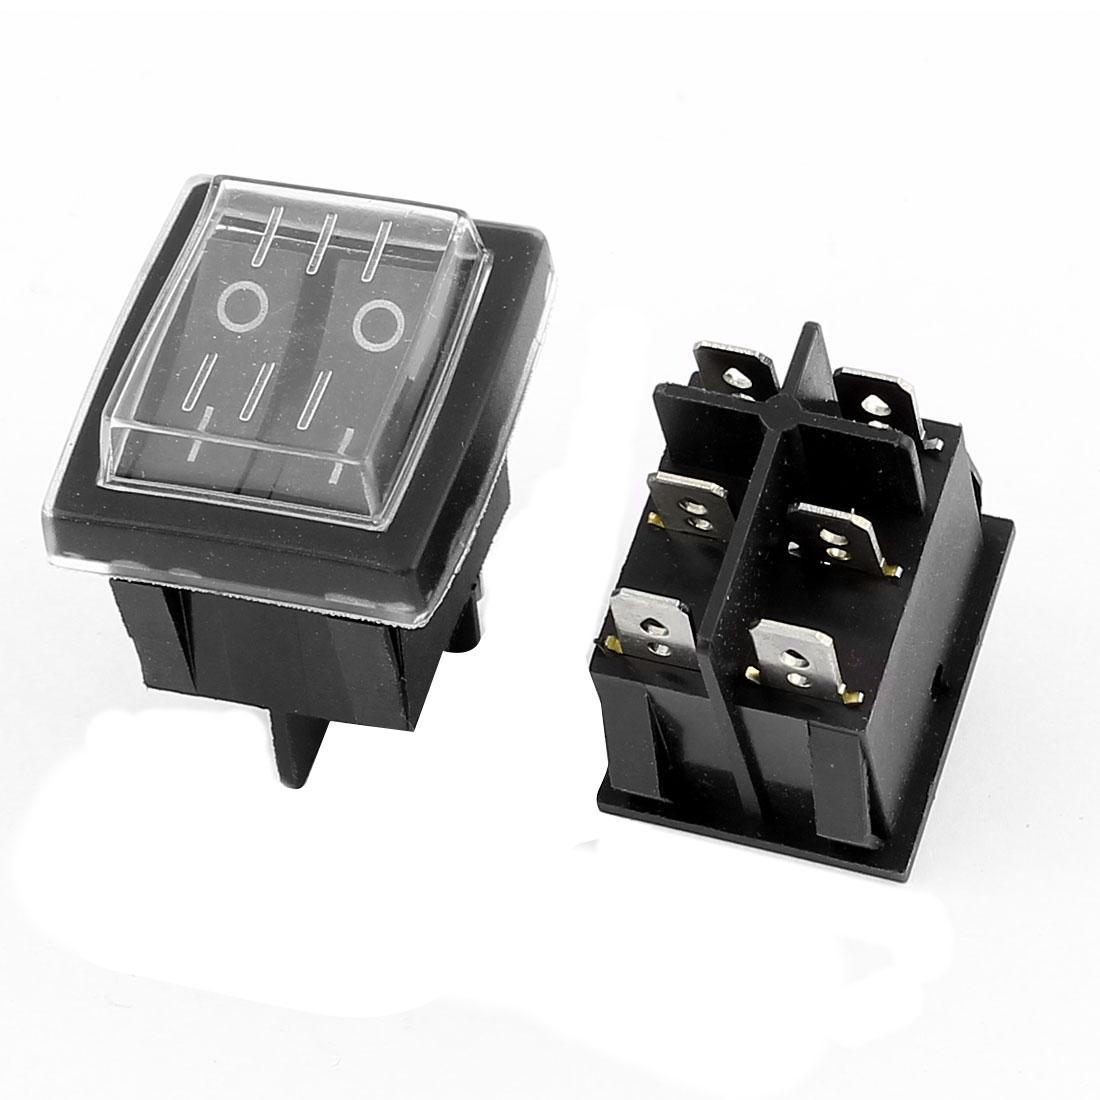 2Pcs Dual Snap In Mount I/O 2 Position DPST Rocker Switch AC 250V/15A 125V/20A